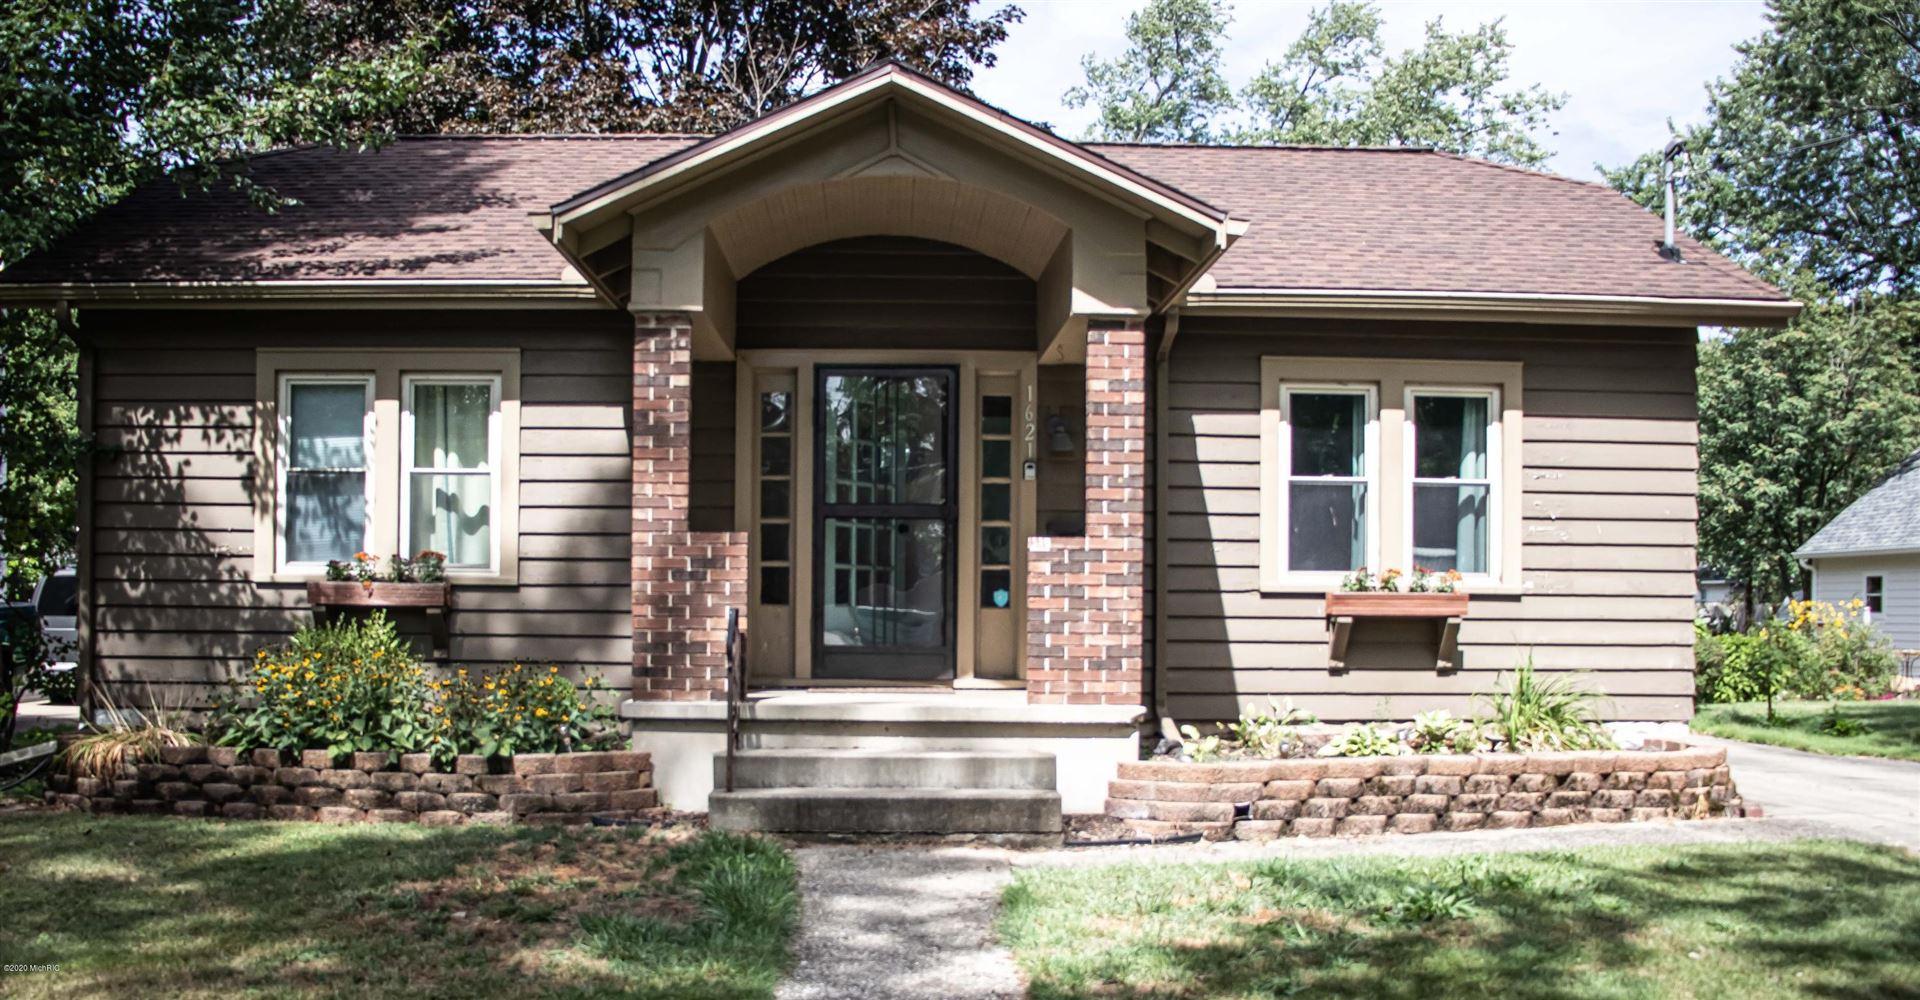 1621 Royce Avenue, Kalamazoo, MI 49001 - MLS#: 20036248